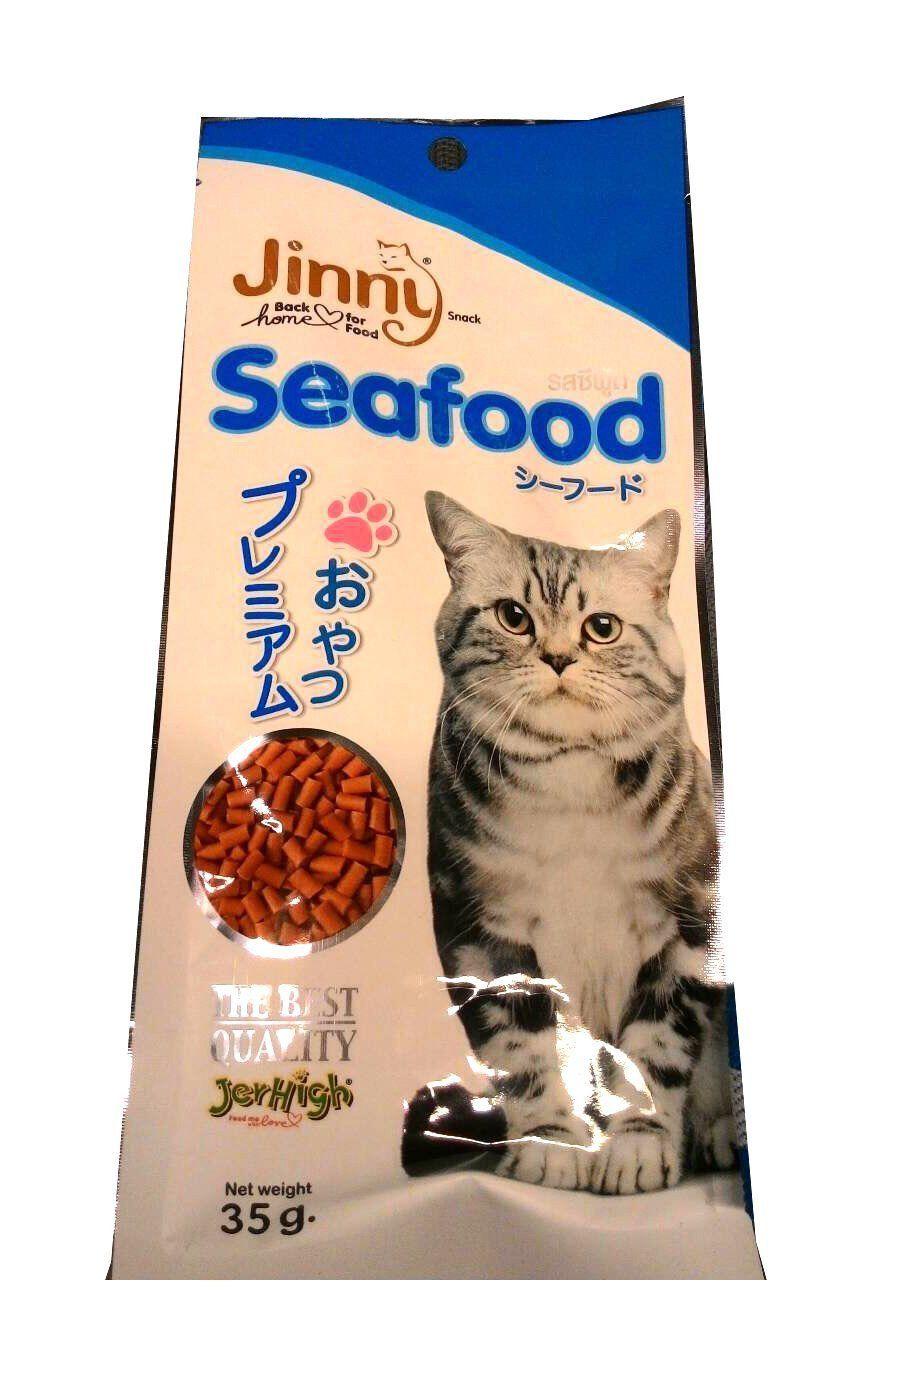 Jerhigh , Jinny Chicken Cat Food Sea Food 35g X 3 Pack